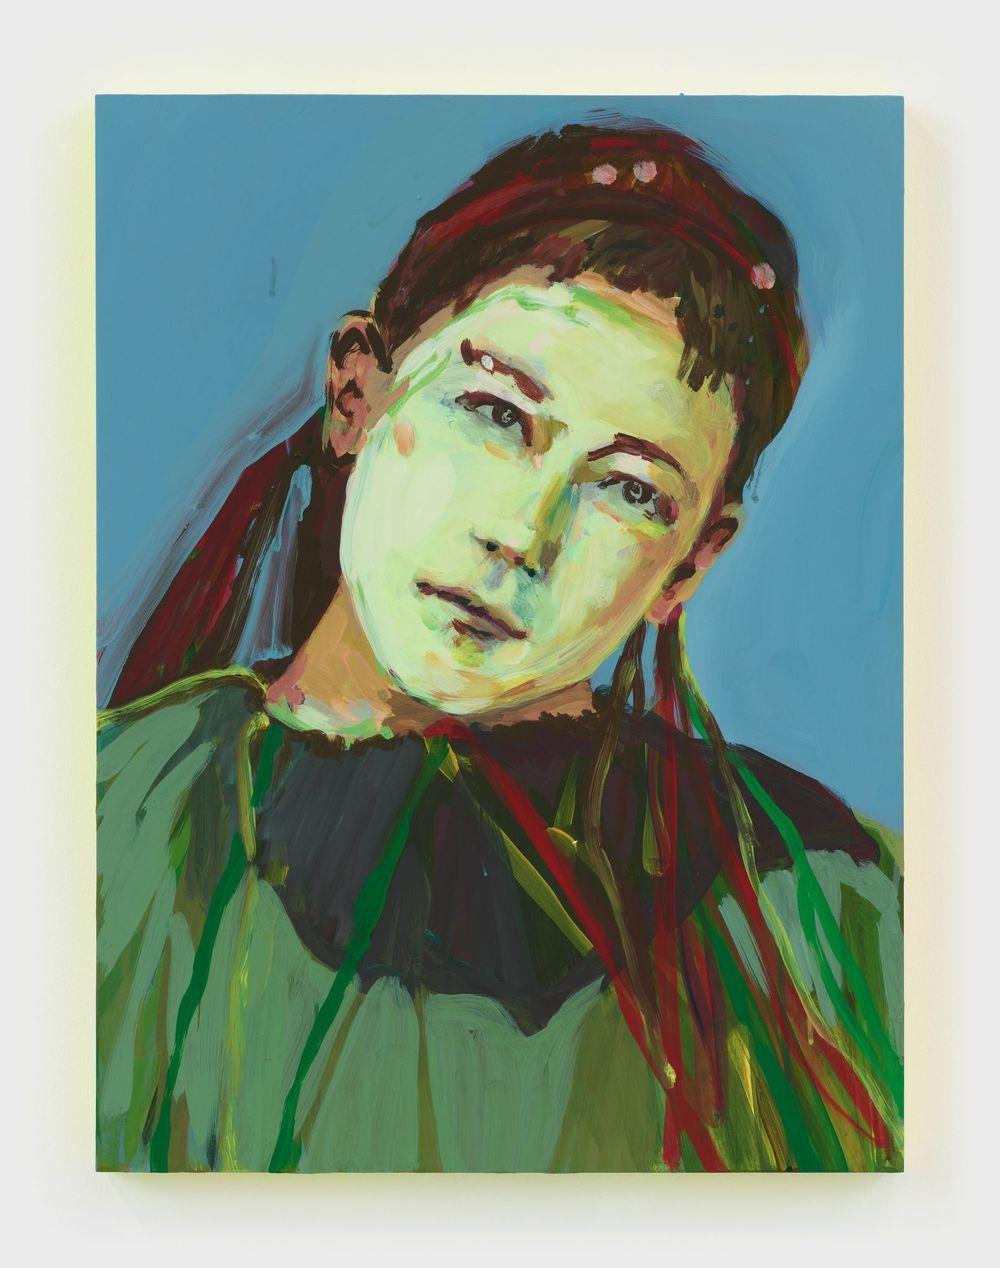 Artist:Claire TABOURET, Exhibition:SIBLINGS